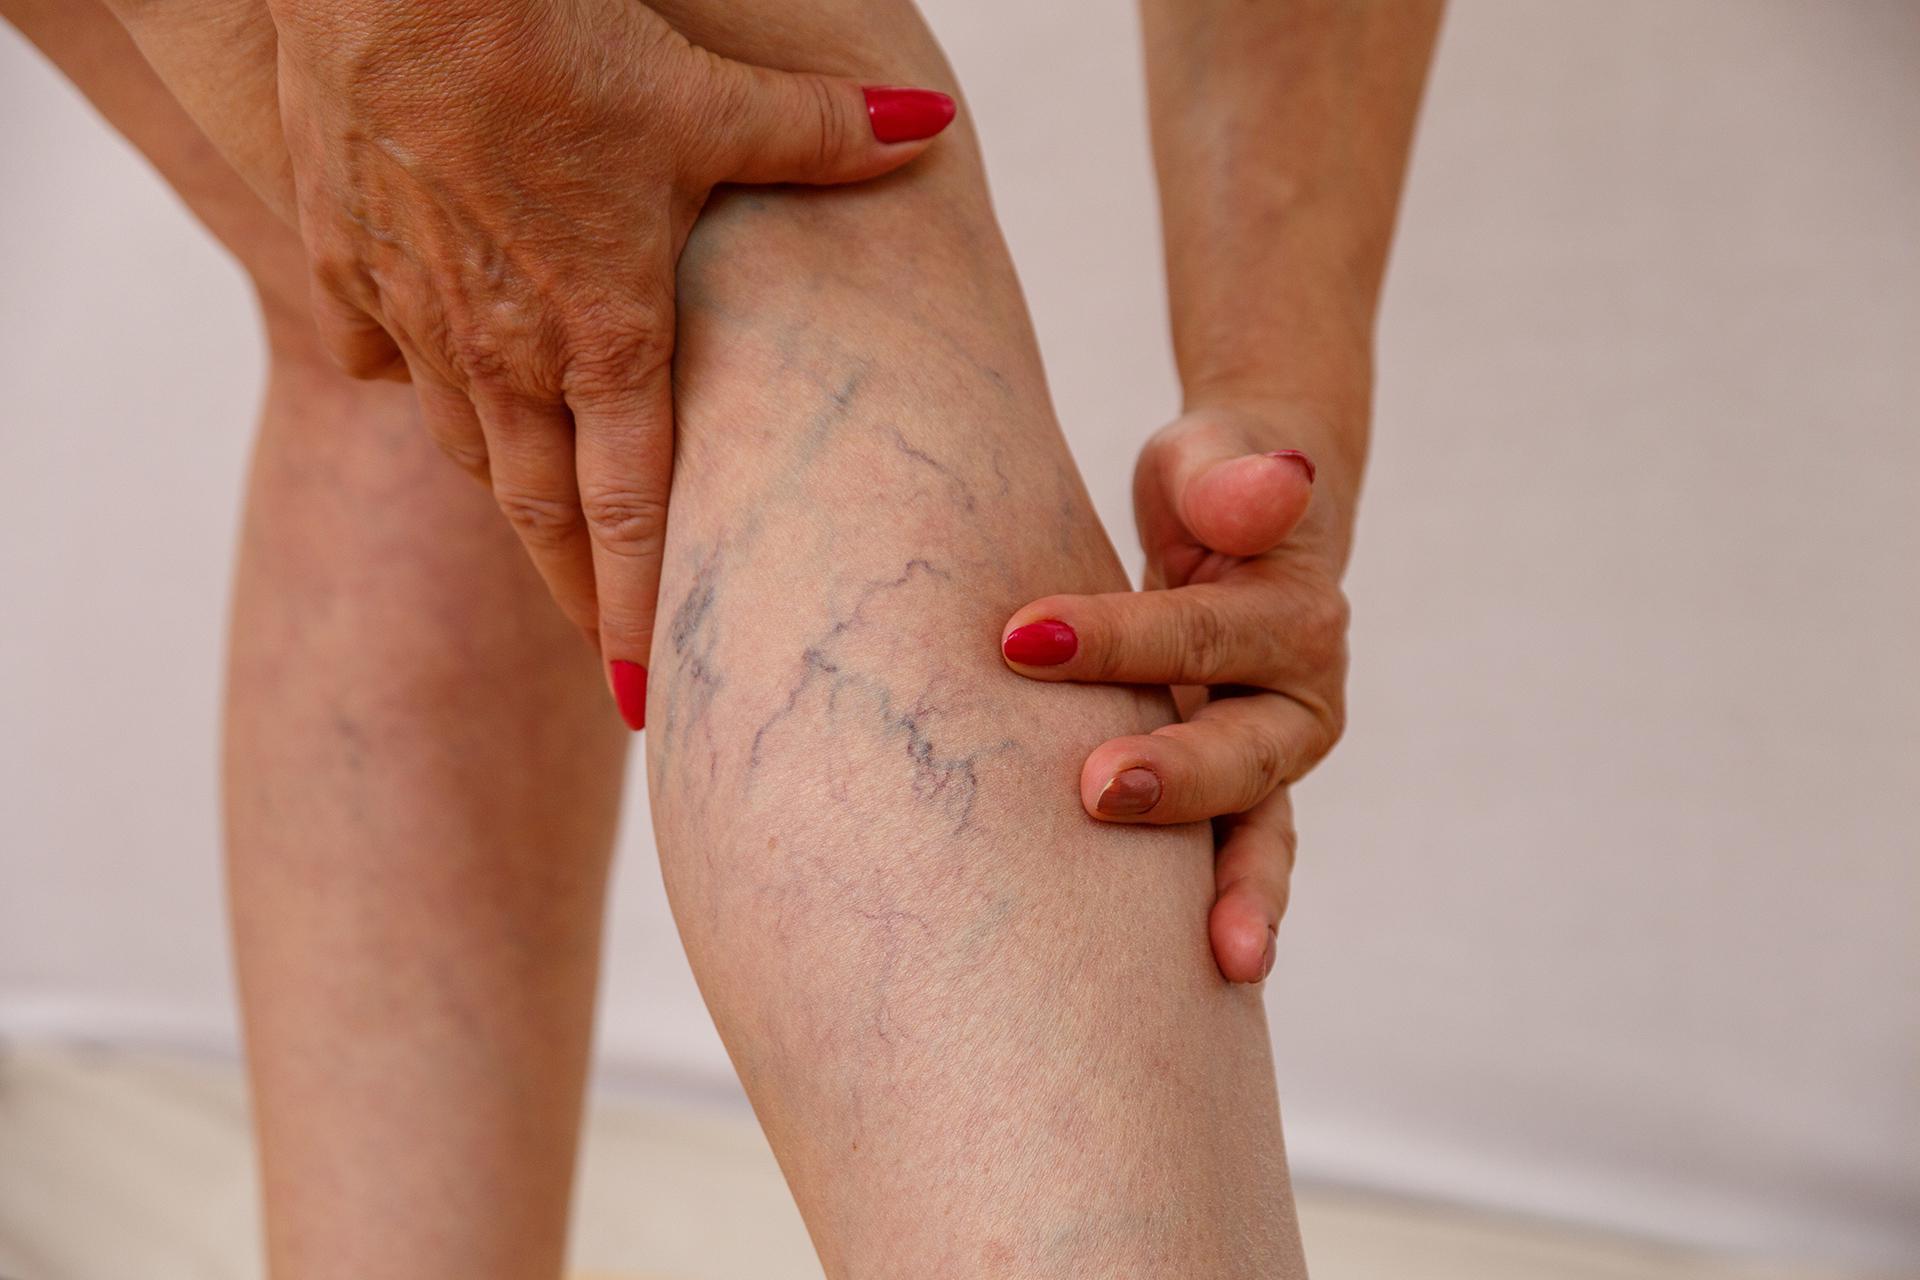 vascular-issues-requiring-leg-pain-doctor-Port-Hueneme-CBC-Base